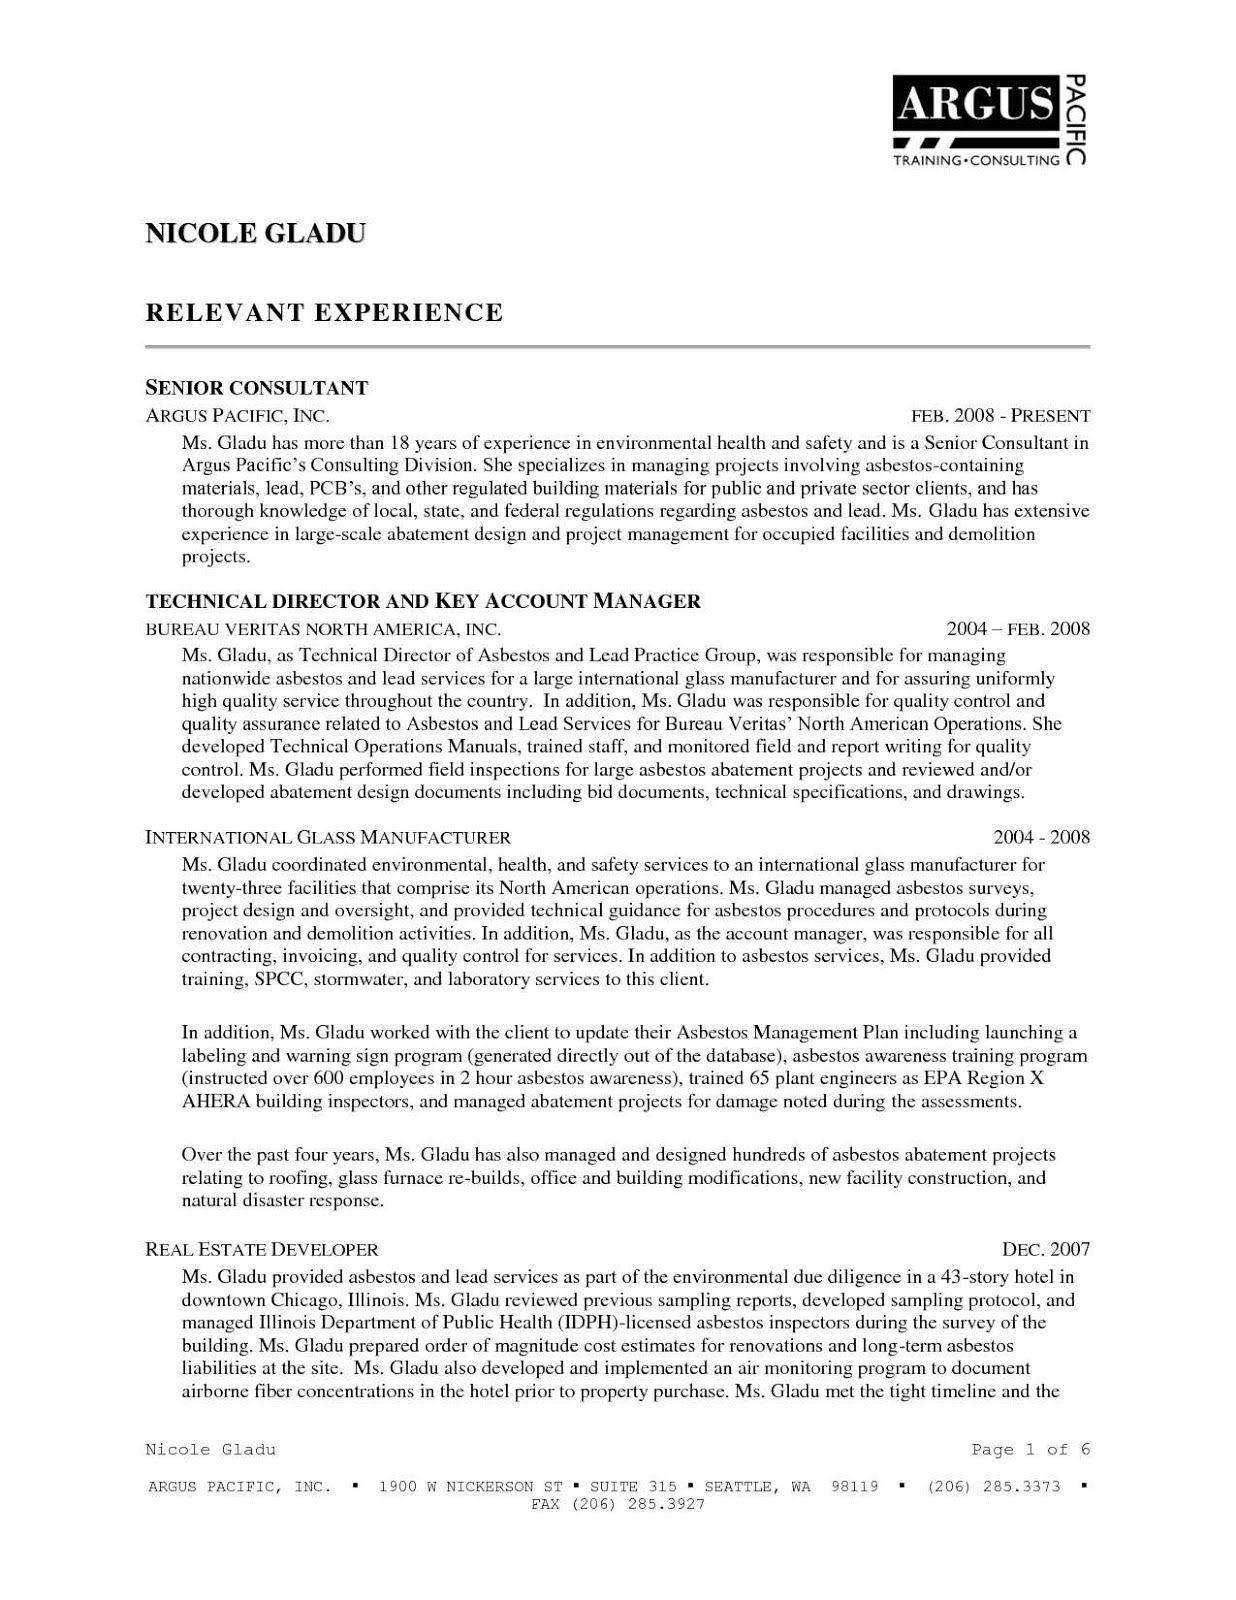 Apartment Maintenance Technician Resume Job Resume Examples Job Resume Samples Resume